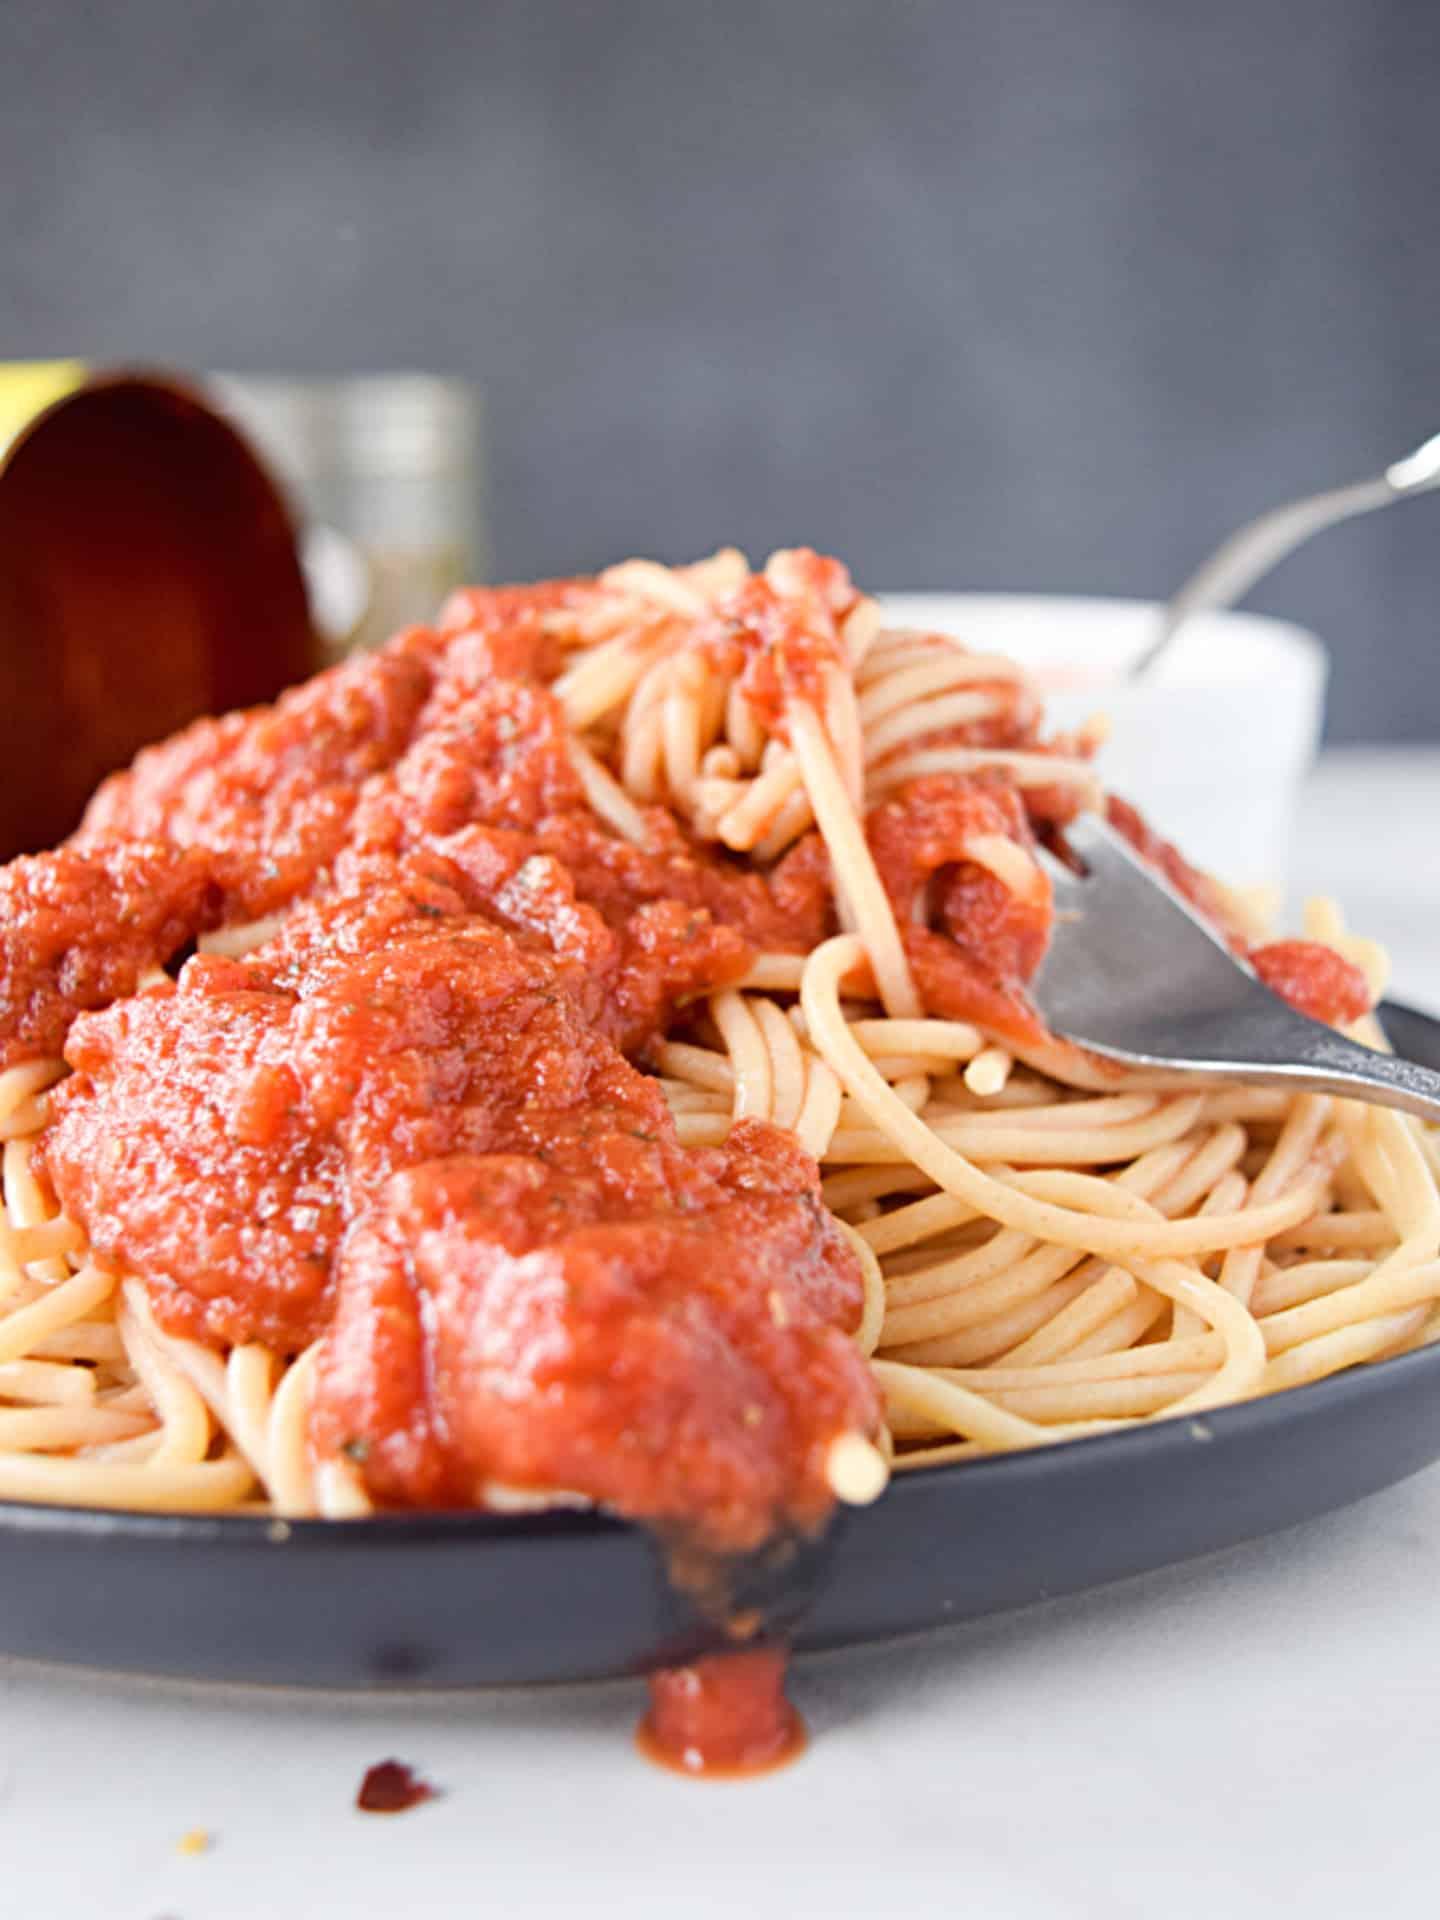 vegan marinara and pasta.